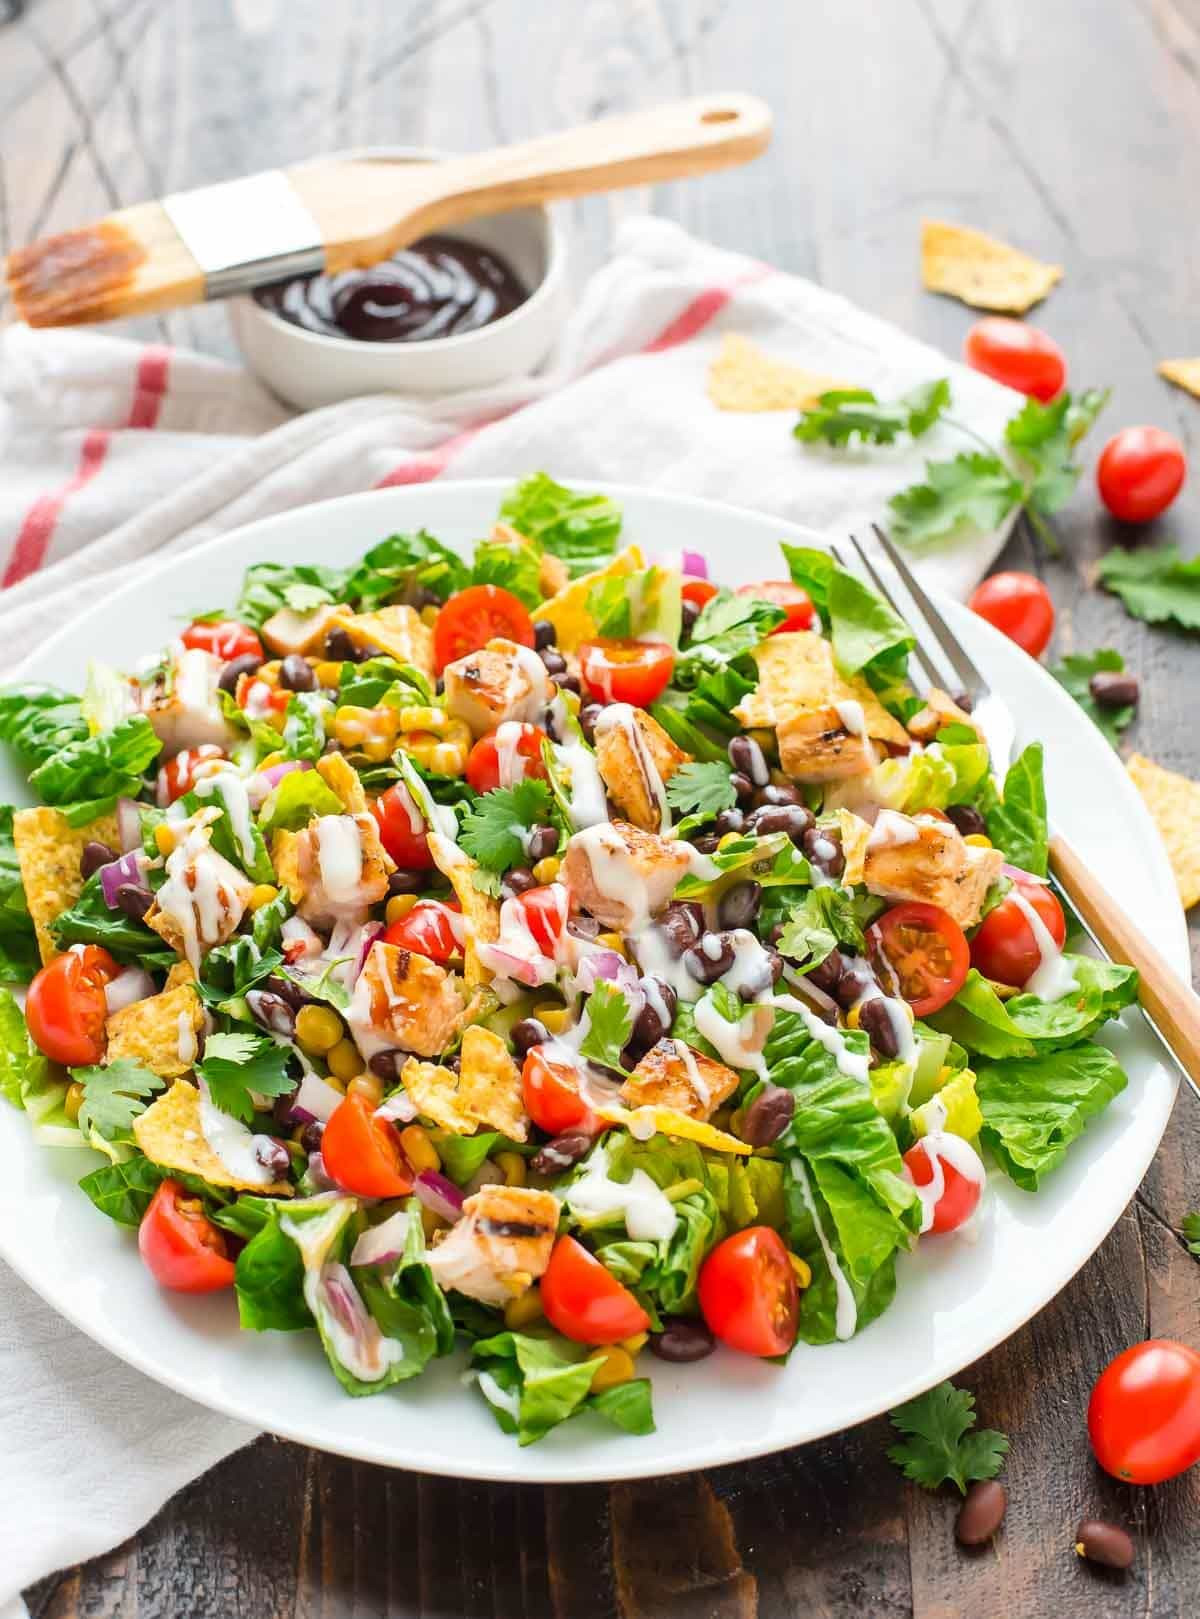 Chicken Salad Recipe Healthy  BBQ Chicken Salad with Creamy Ranch